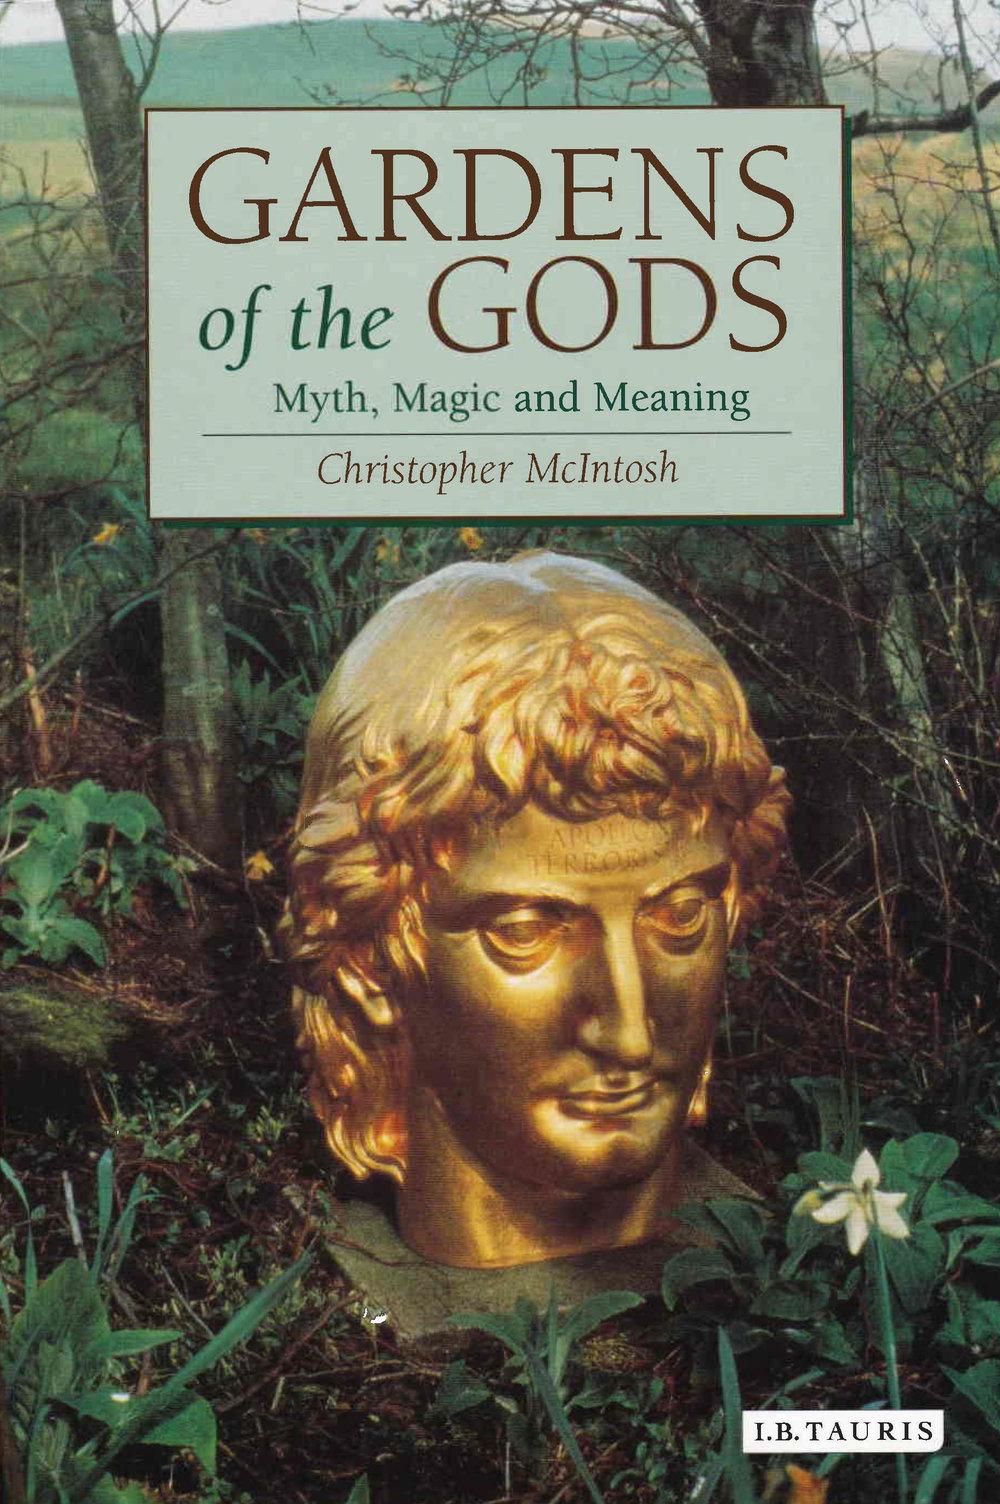 Gardens of the Gods (London: I. B. Tauris, 2005).